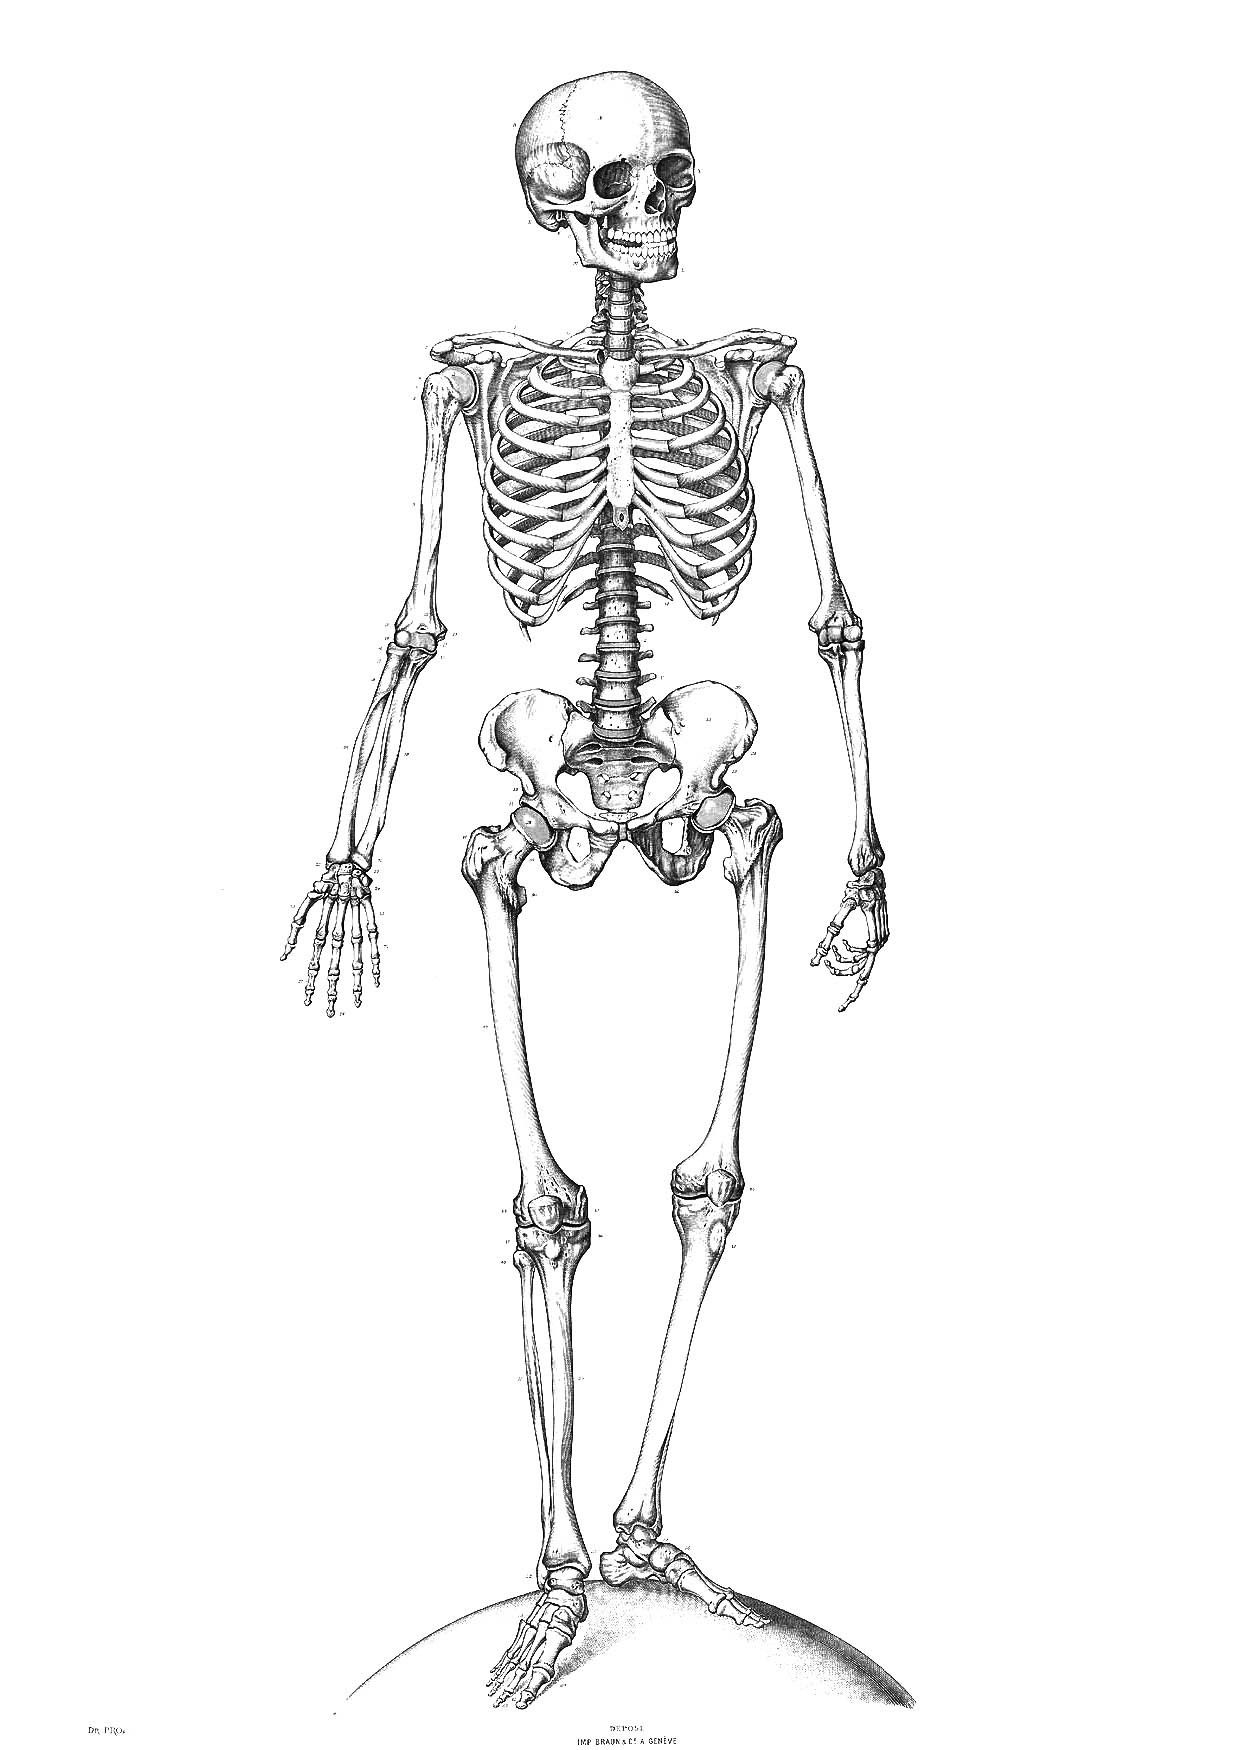 unlabeled human skeleton diagram unlabeled human skeleton diagram blank human skeleton diagram printable human skeleton [ 1240 x 1750 Pixel ]